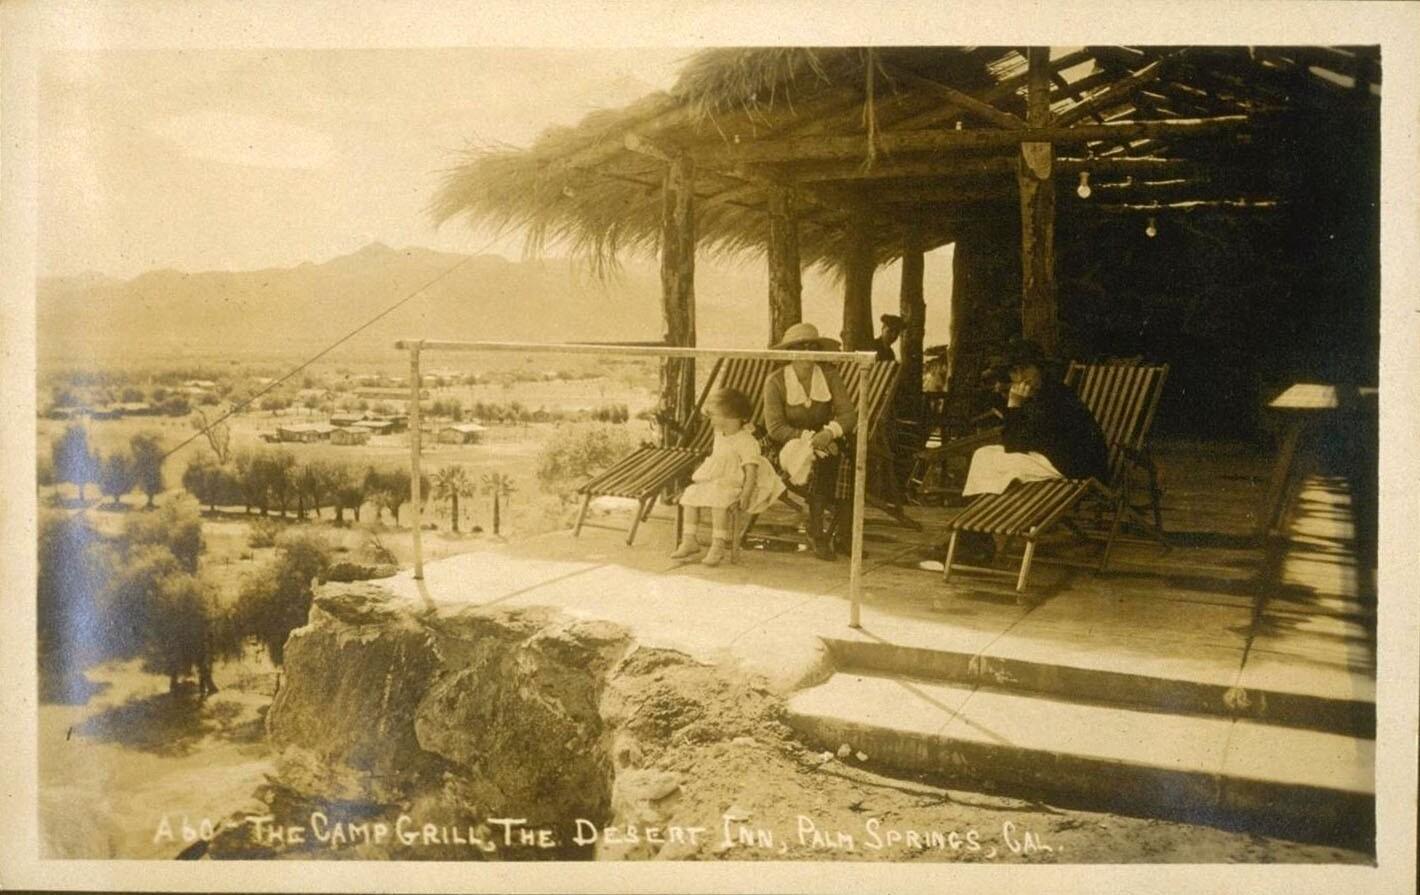 The Camp Grill, The Desert Inn, Palm Springs, Cal.